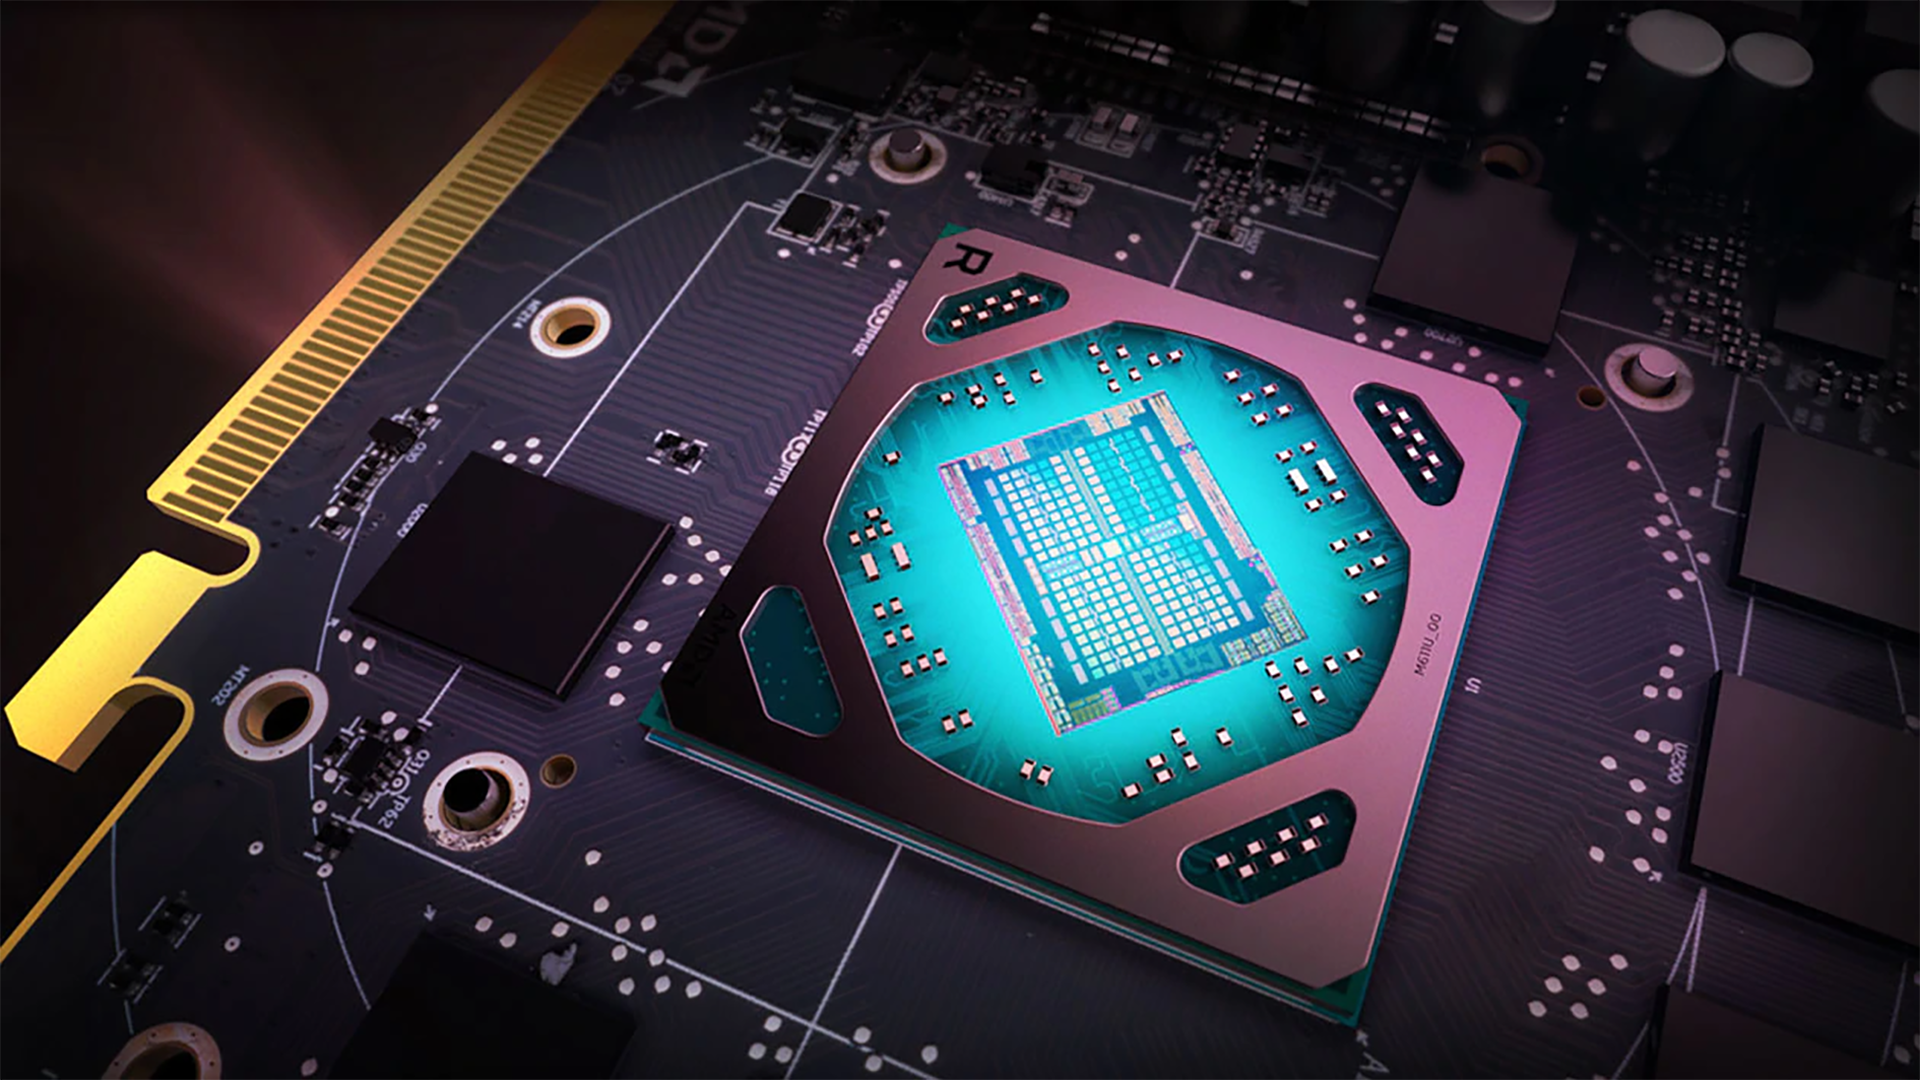 AMD ATI MOBILITY RADEON X2300 drivers for …